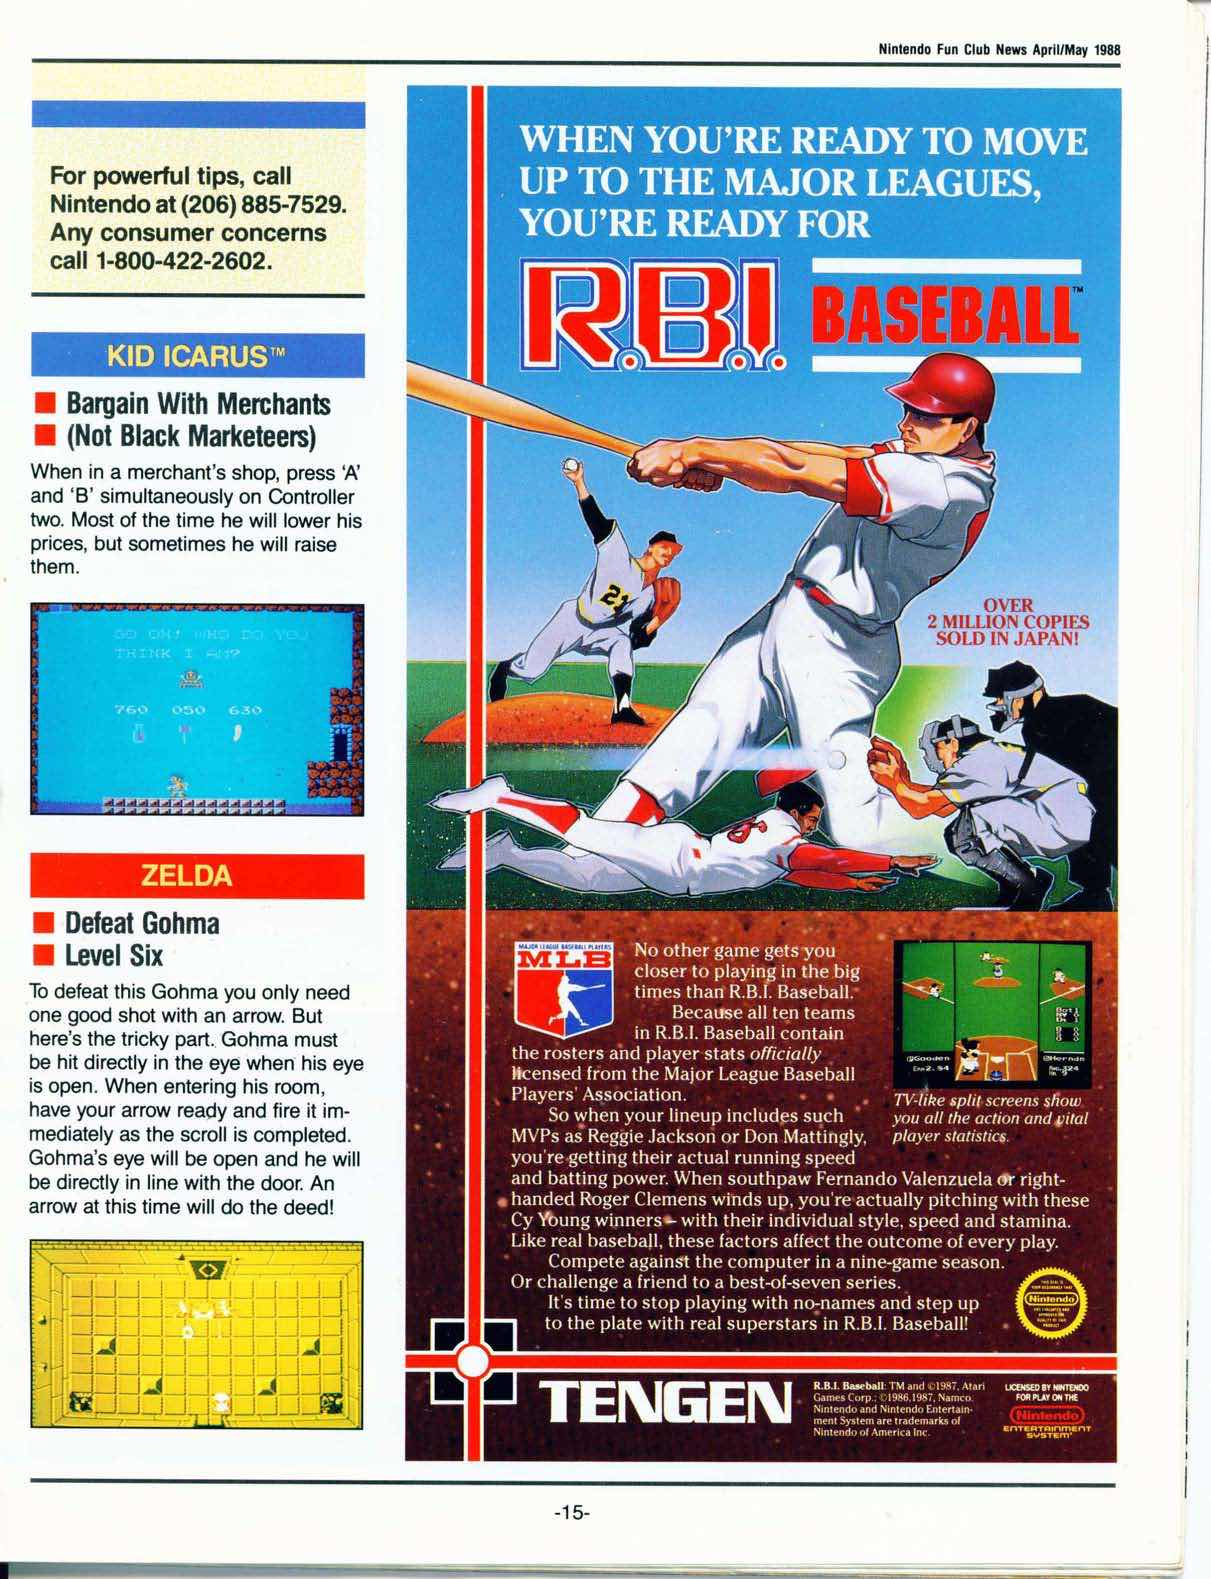 Nintendo Fun Club News April-May 1988 pg15